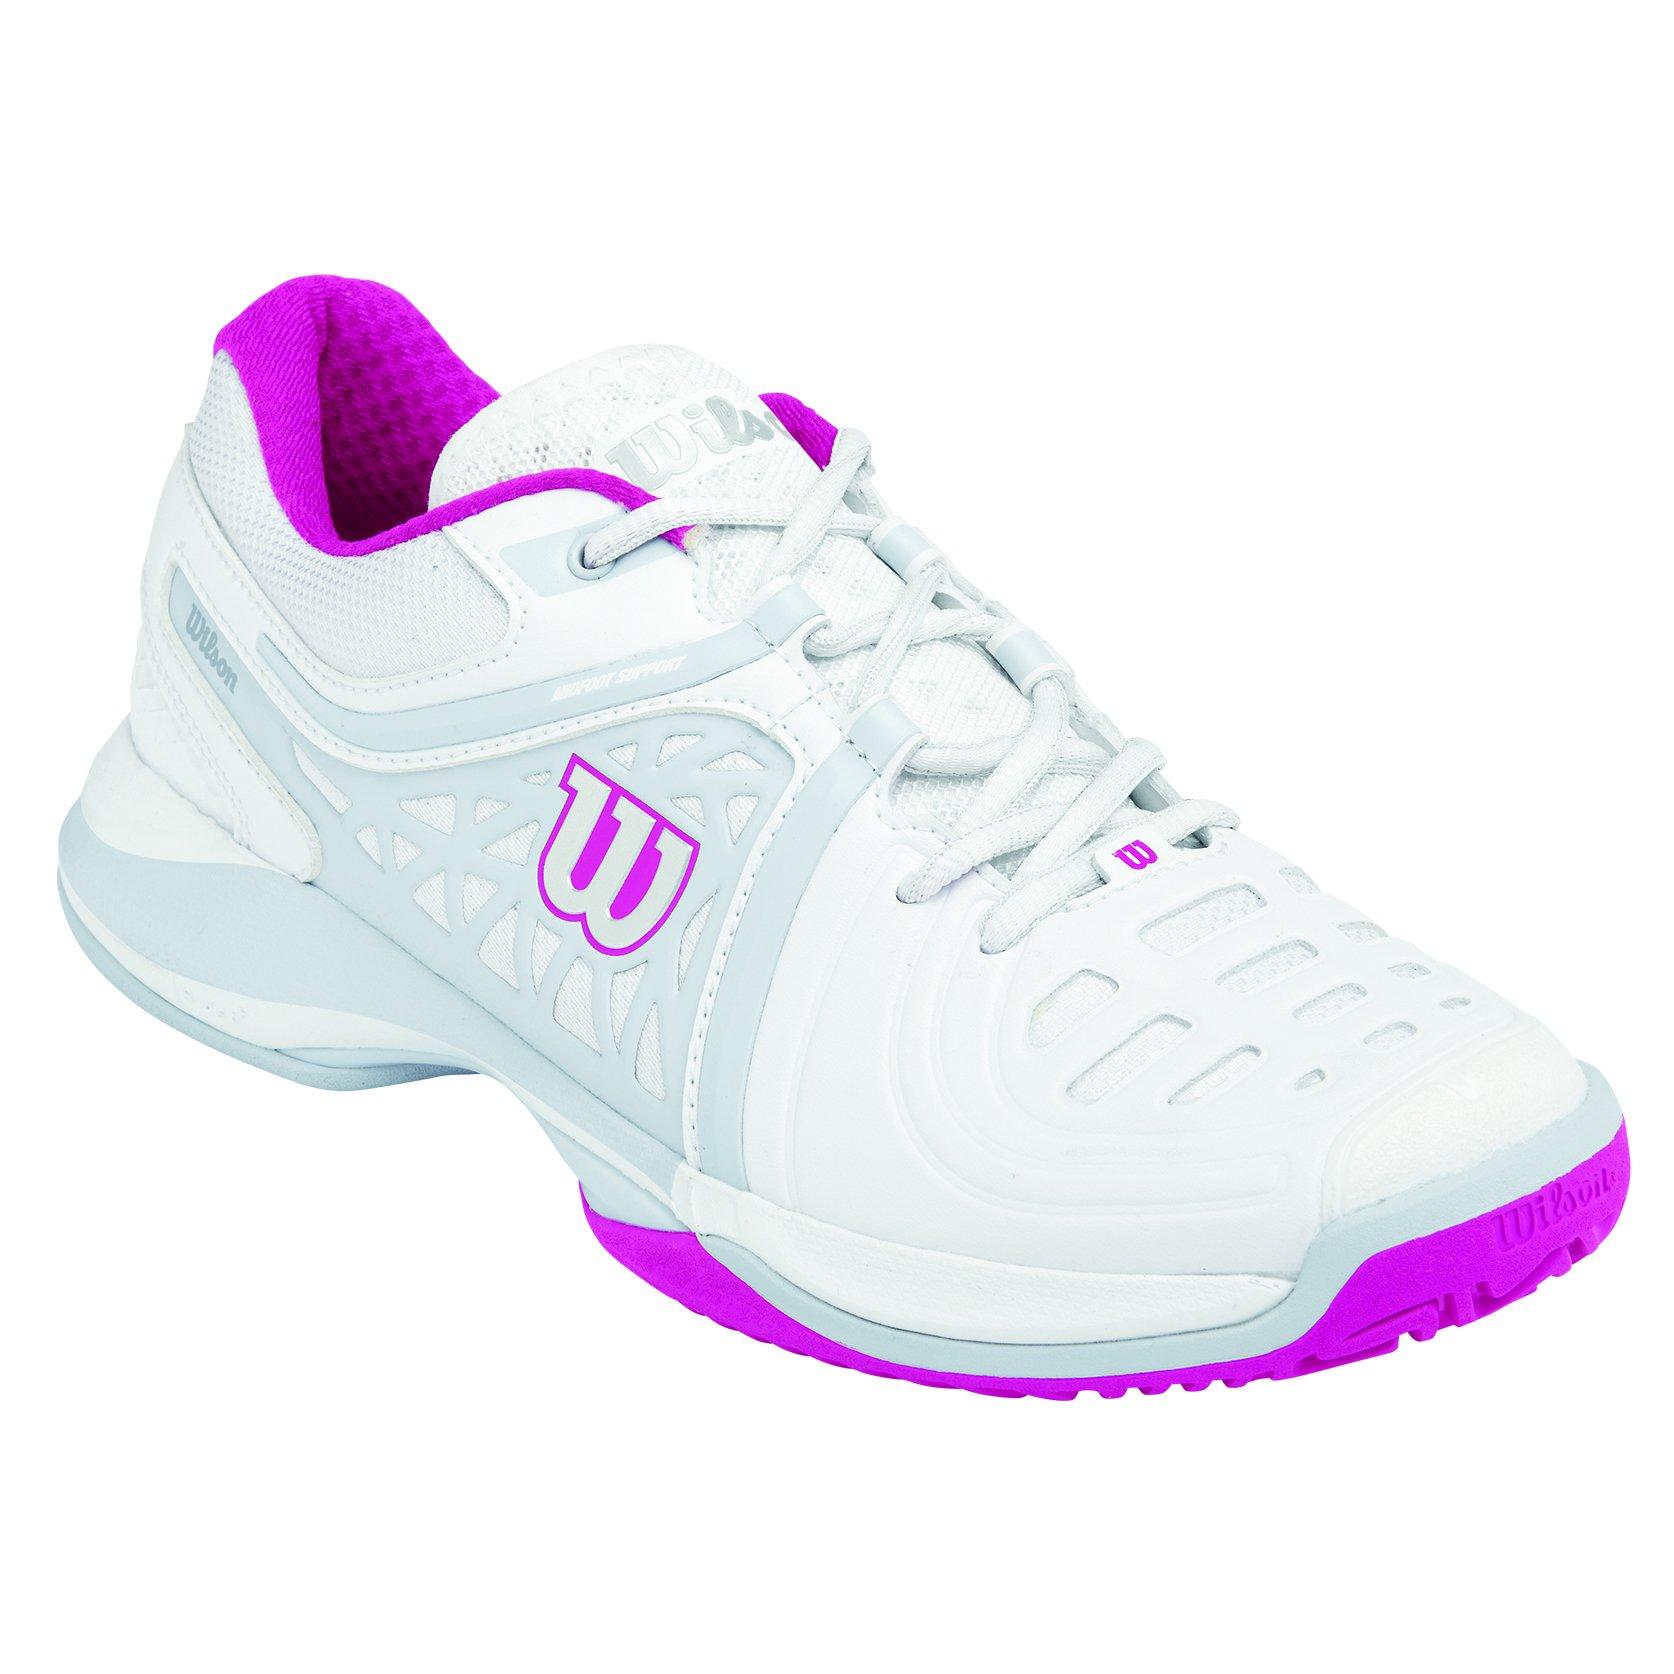 Wil W Pink 3 De fiesta P Wilson Wi43 1 Wh Gray Tennis pearl 9Chaussures Nvision Eu Elite FemmeBlancwhite O08nkwP